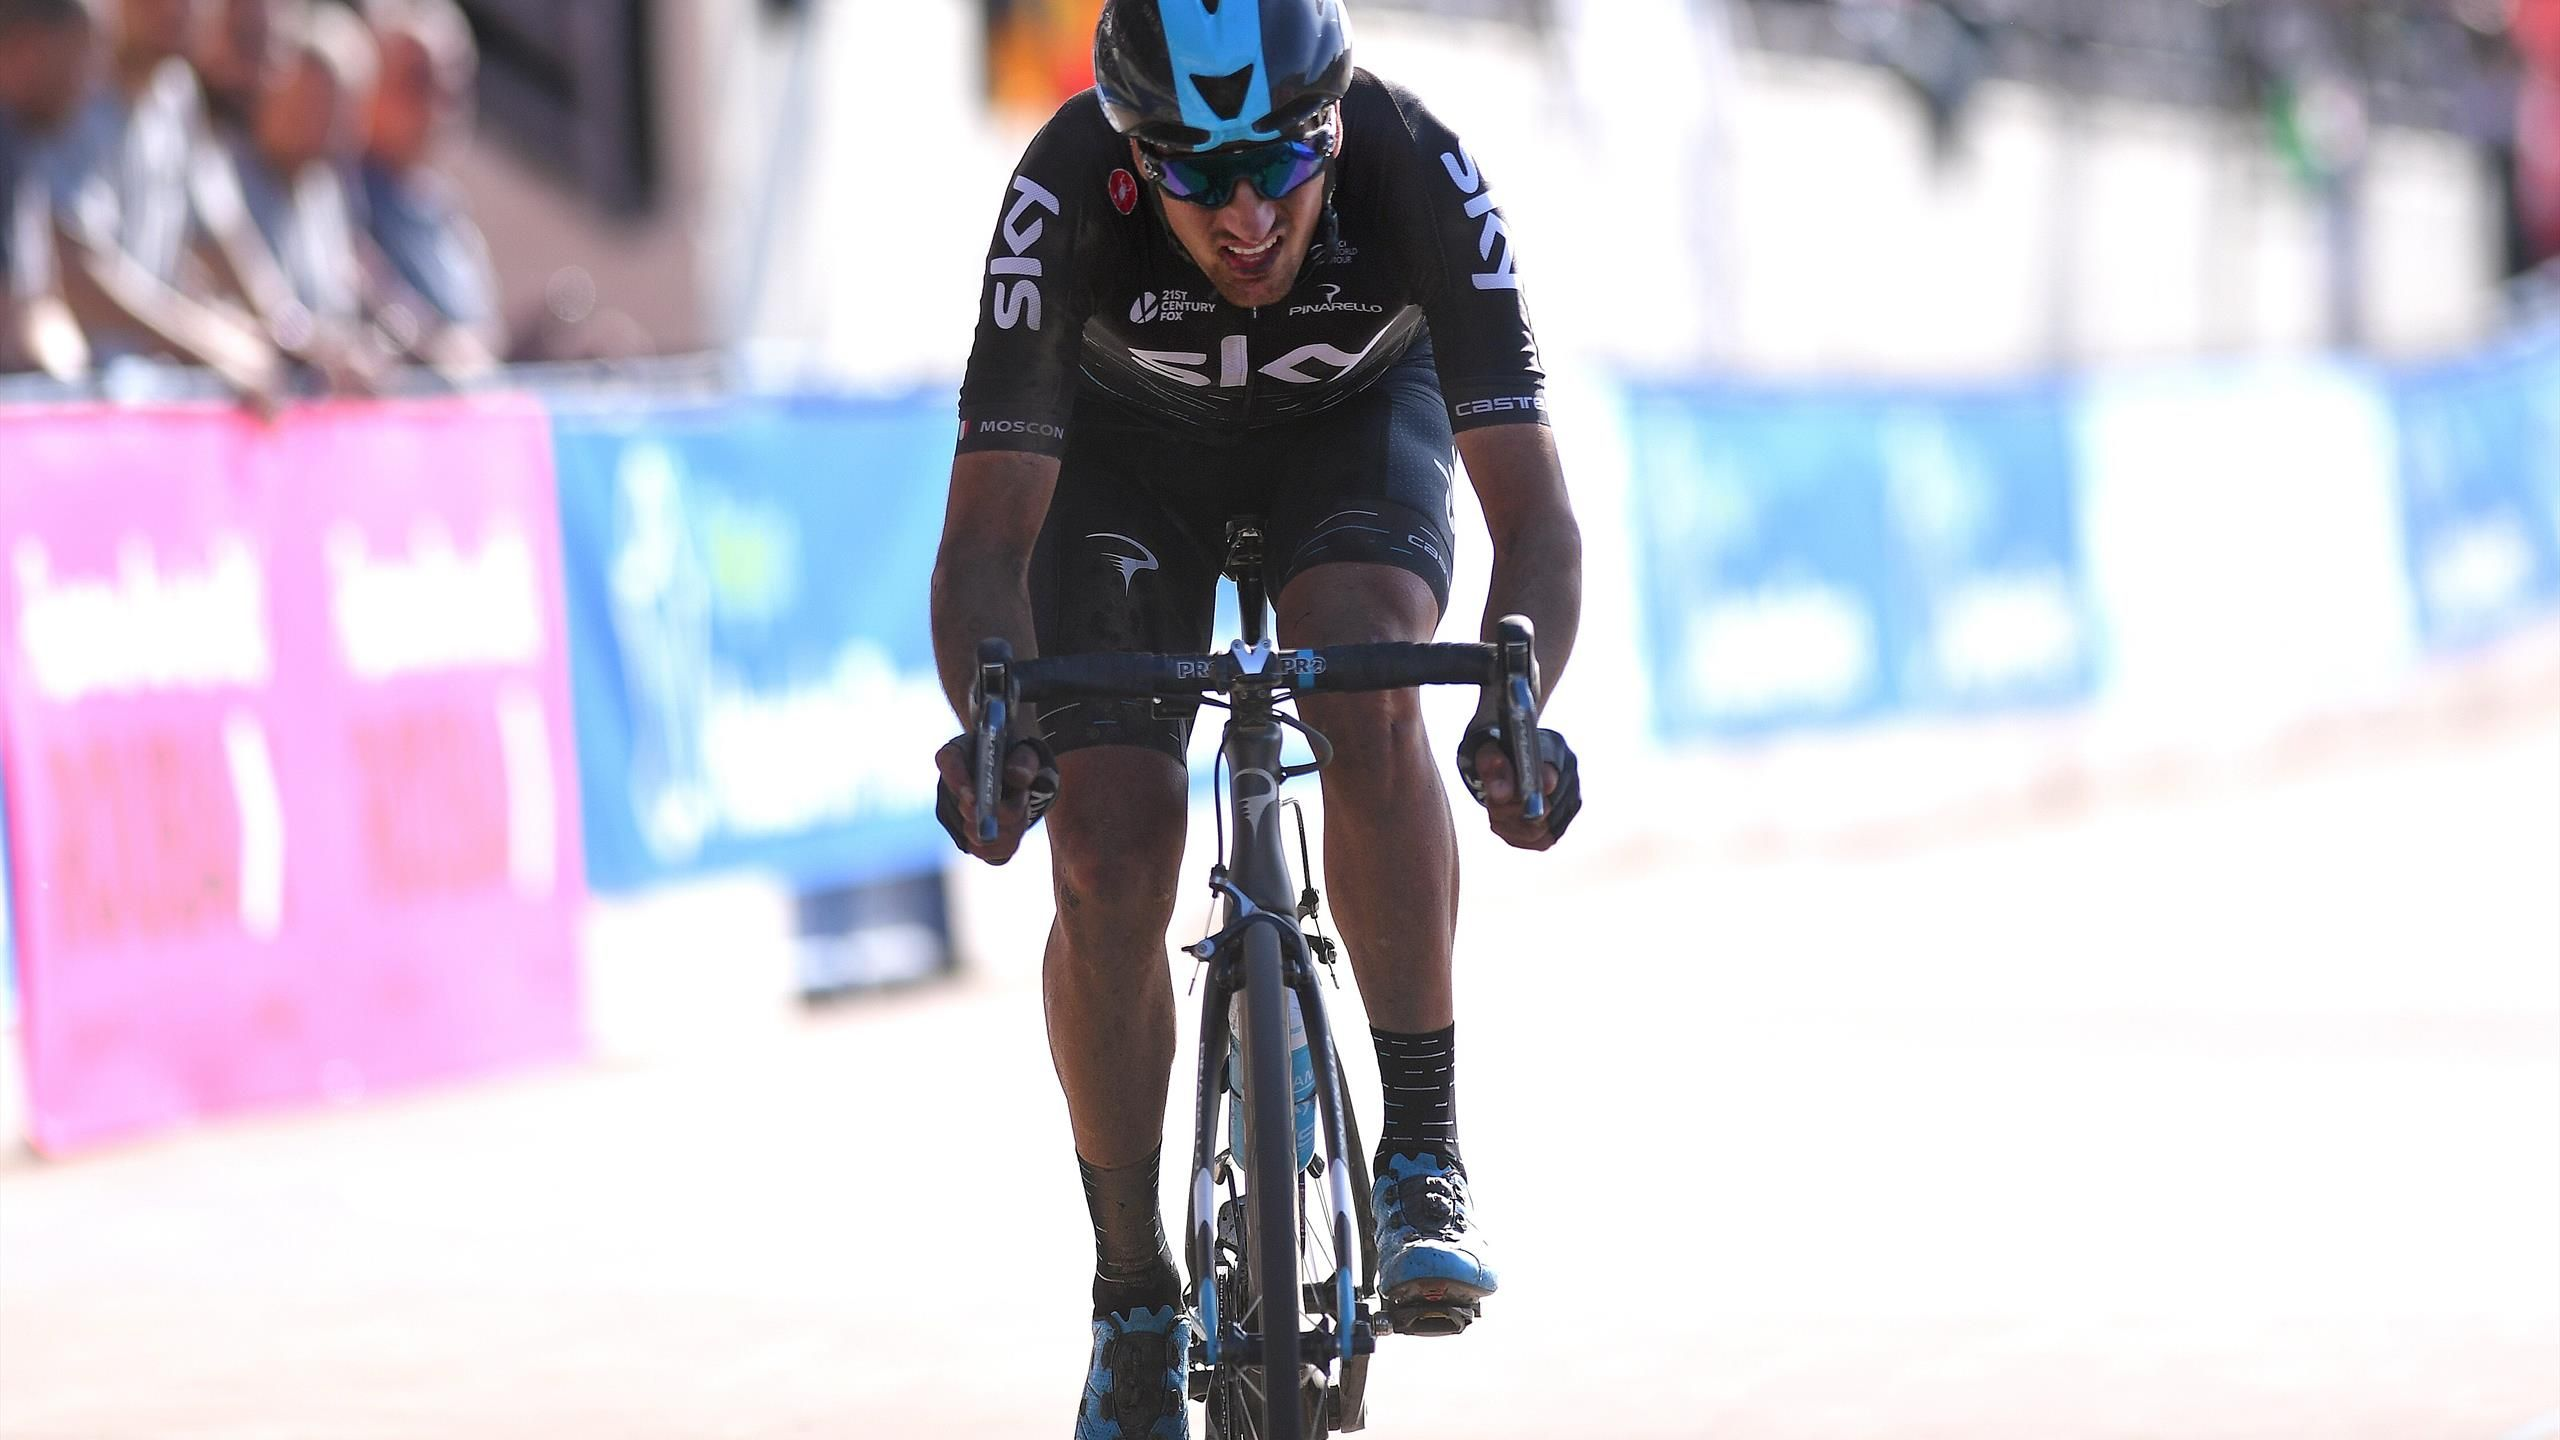 Moscon Parigi-Roubaix 2017